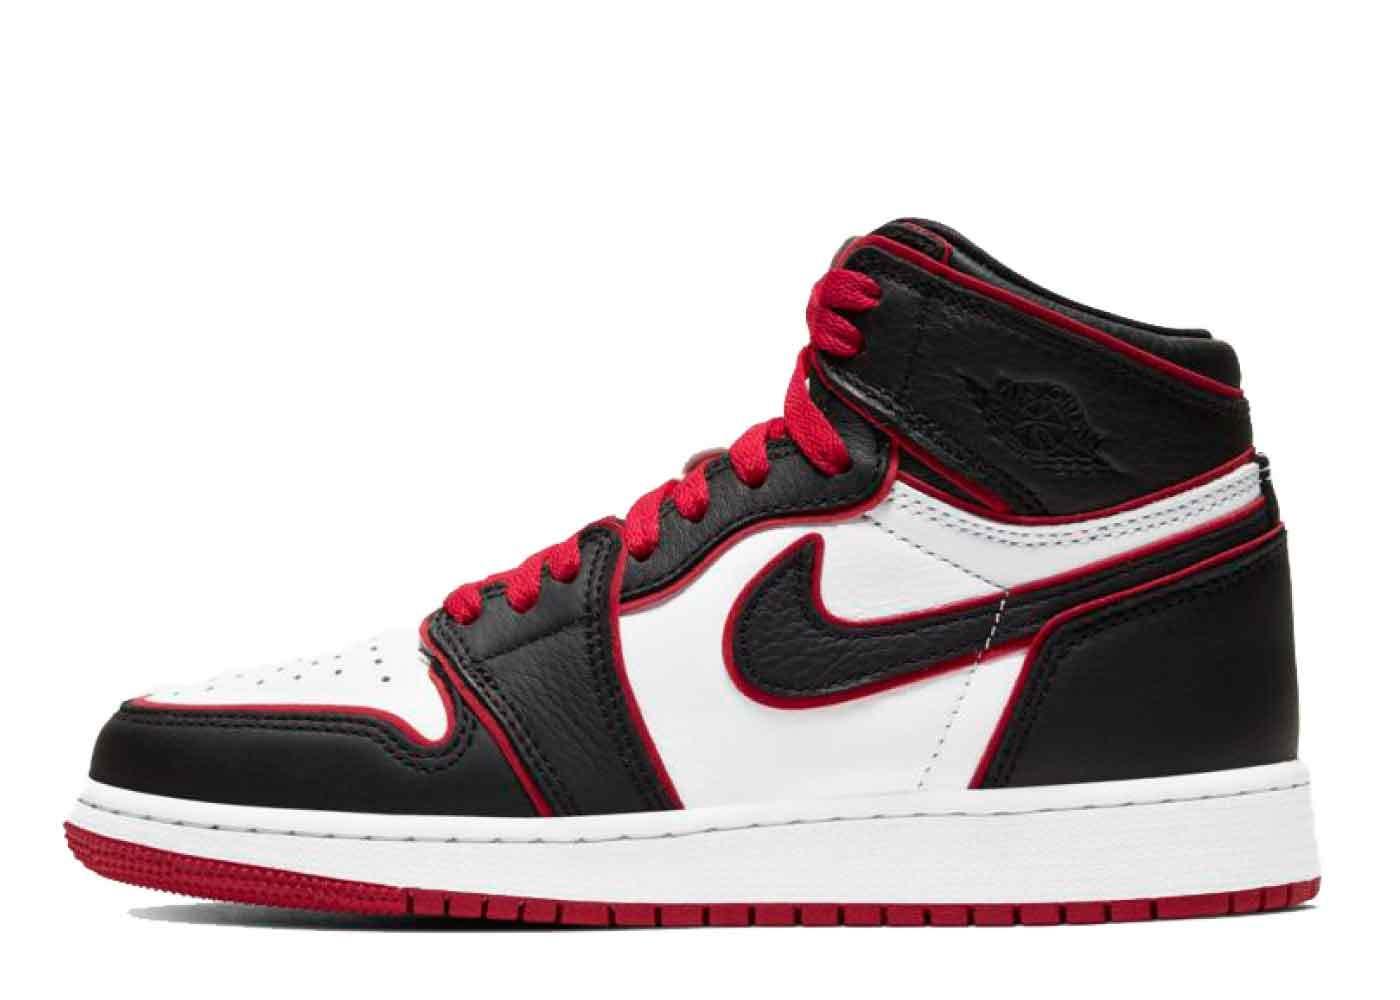 Nike Air Jordan 1 Retro High Bloodline (GS)の写真